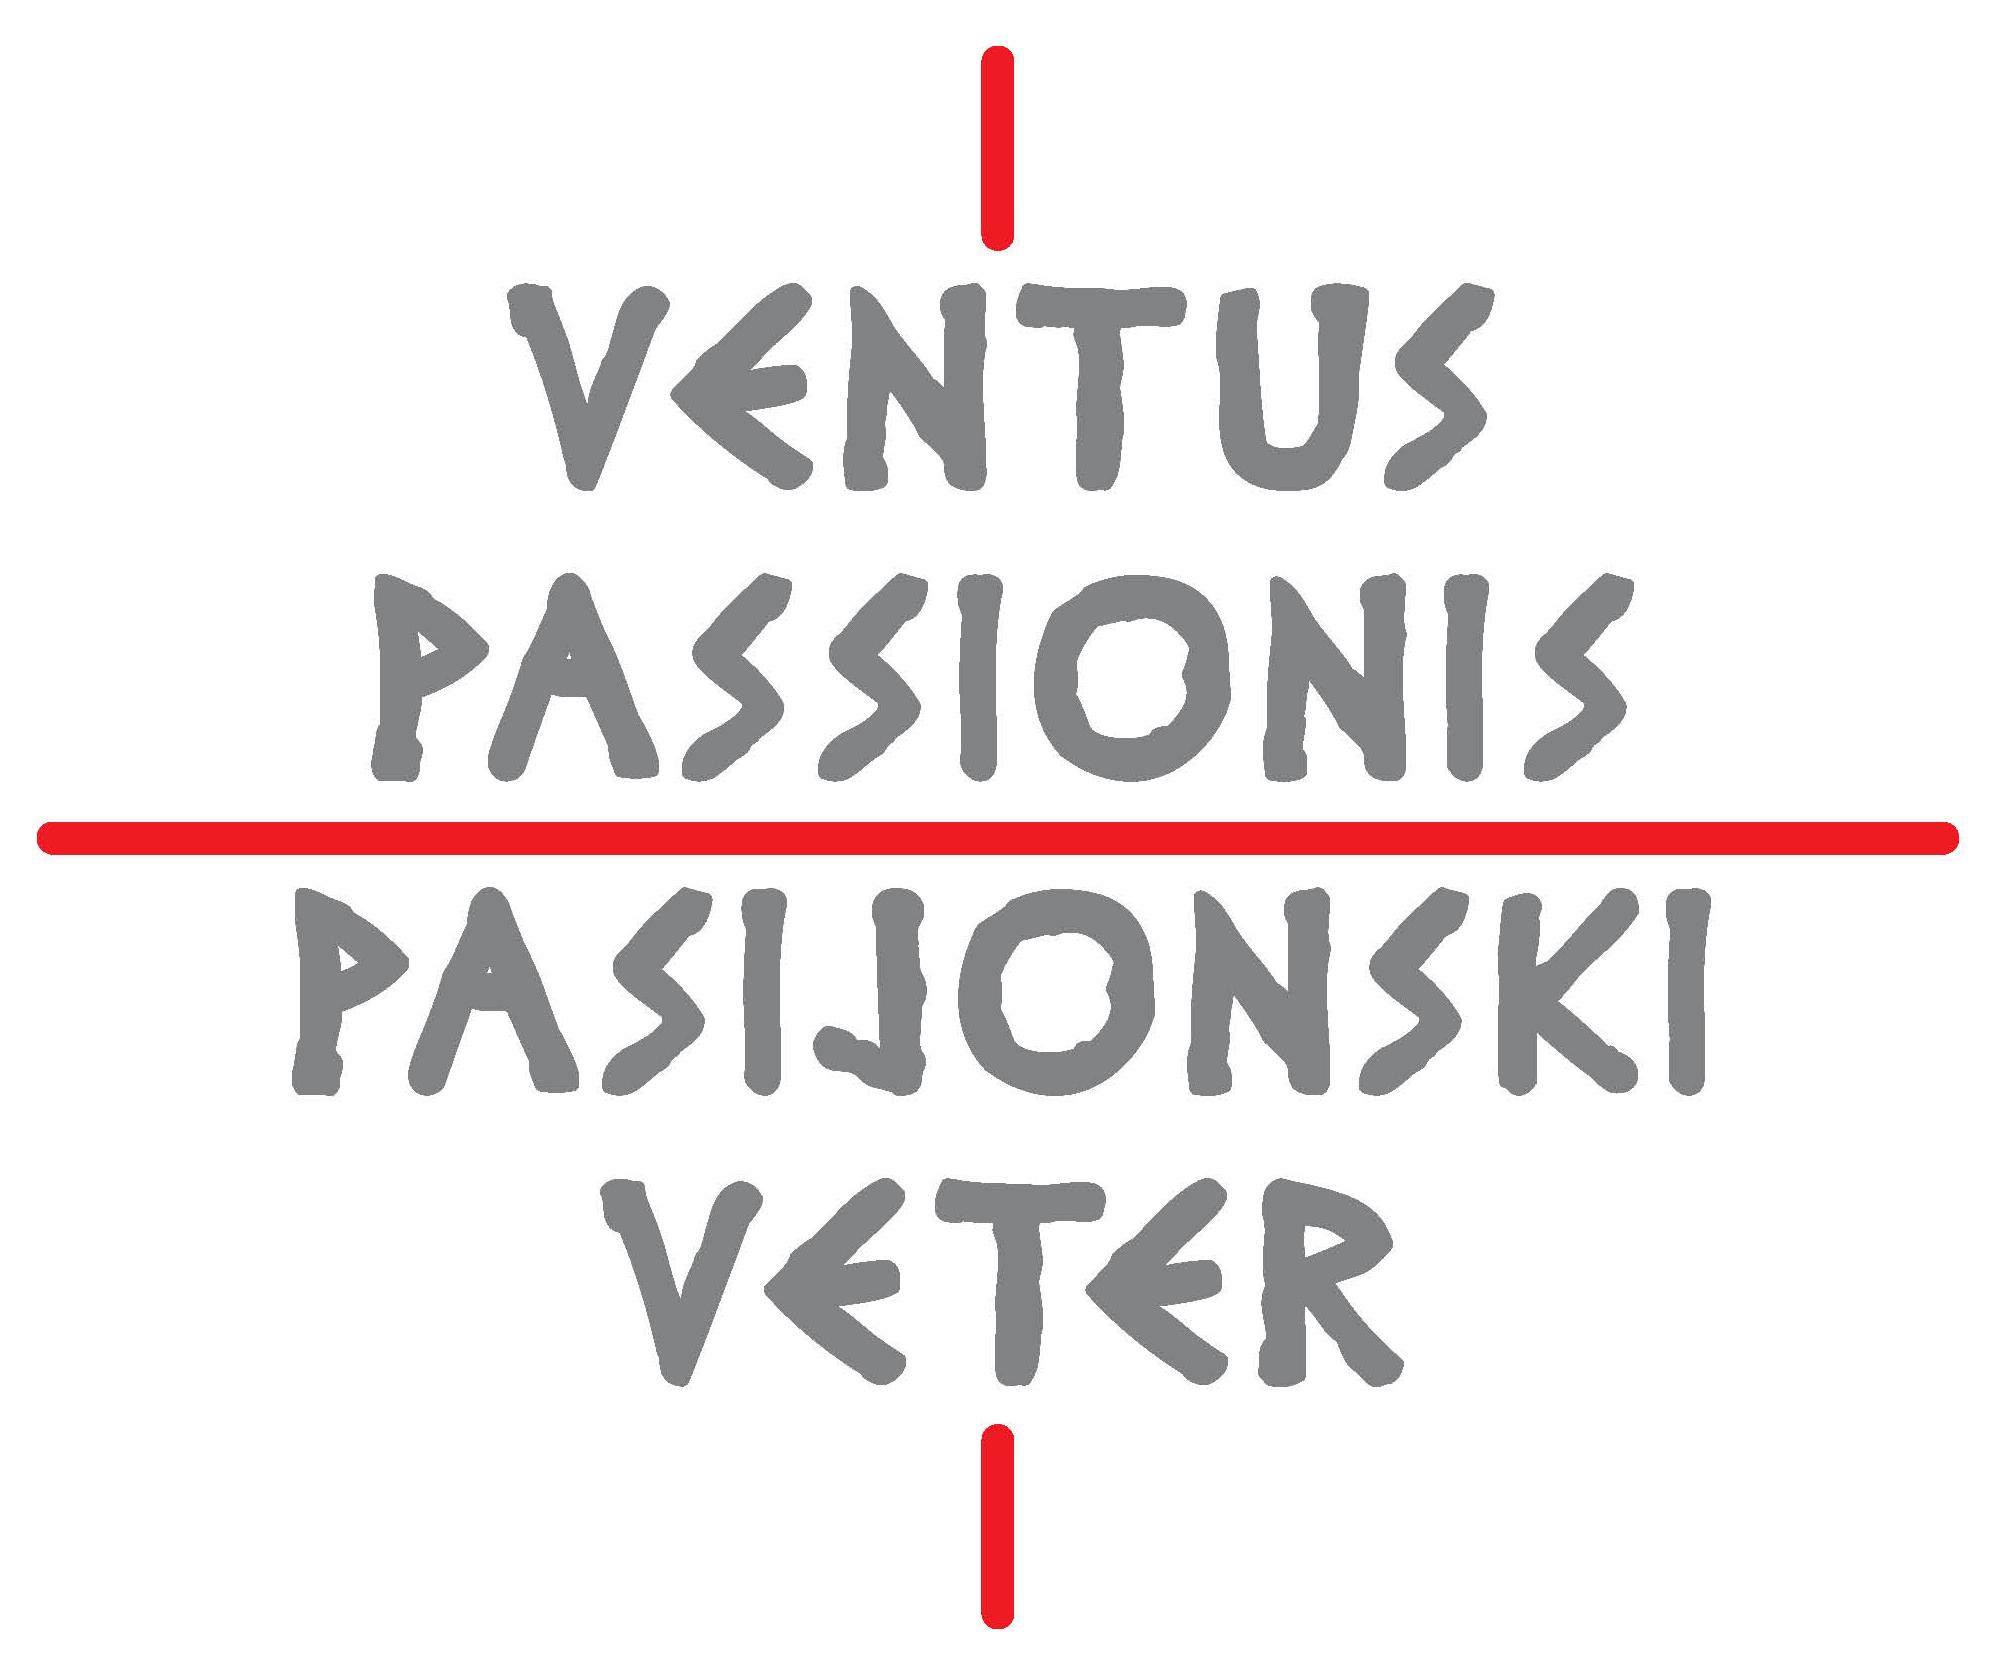 Pasijonski veter Ventus Passionis